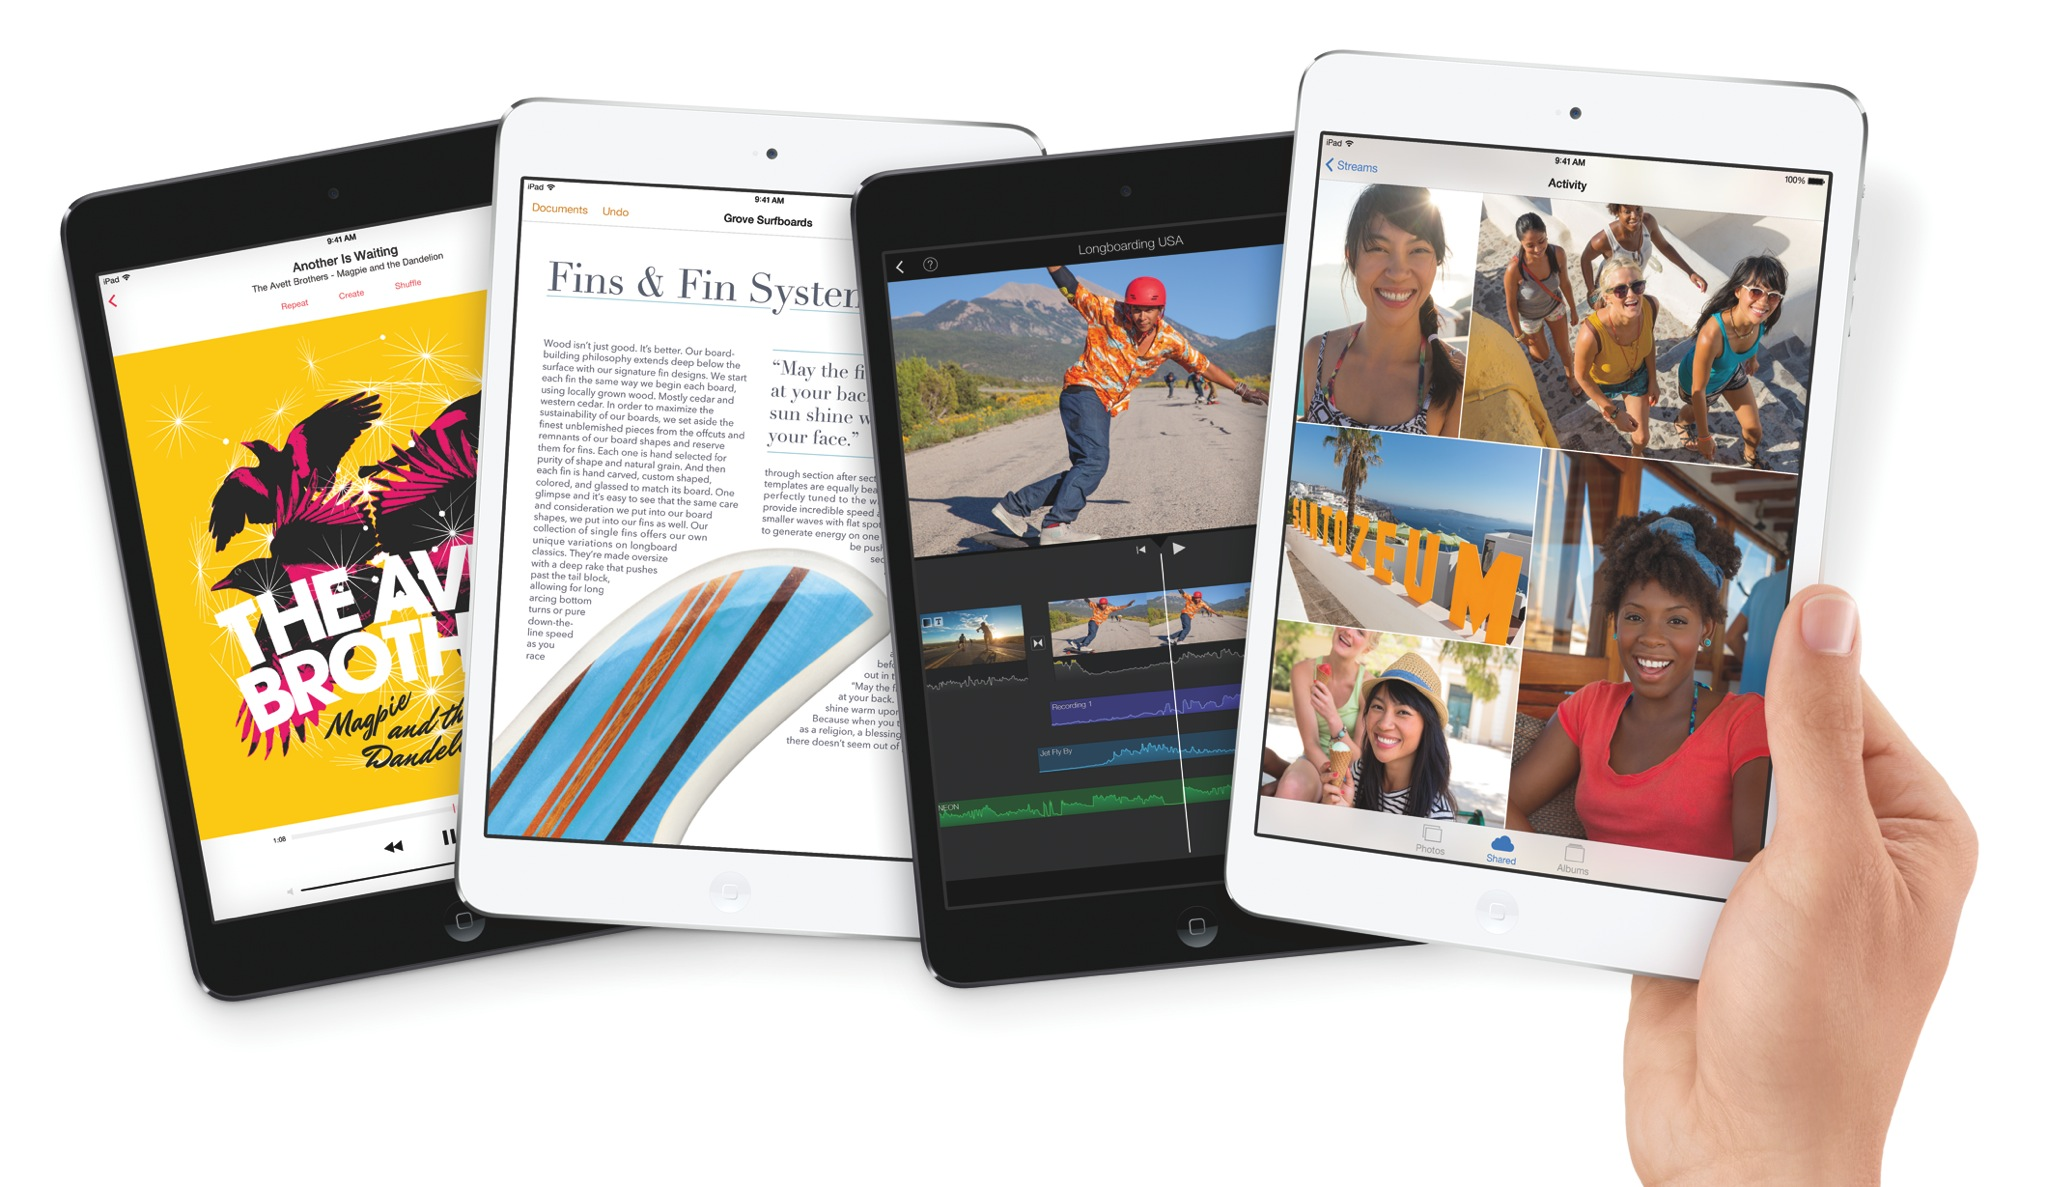 2013 iPad mini 2 (Retina, Four up, hand)